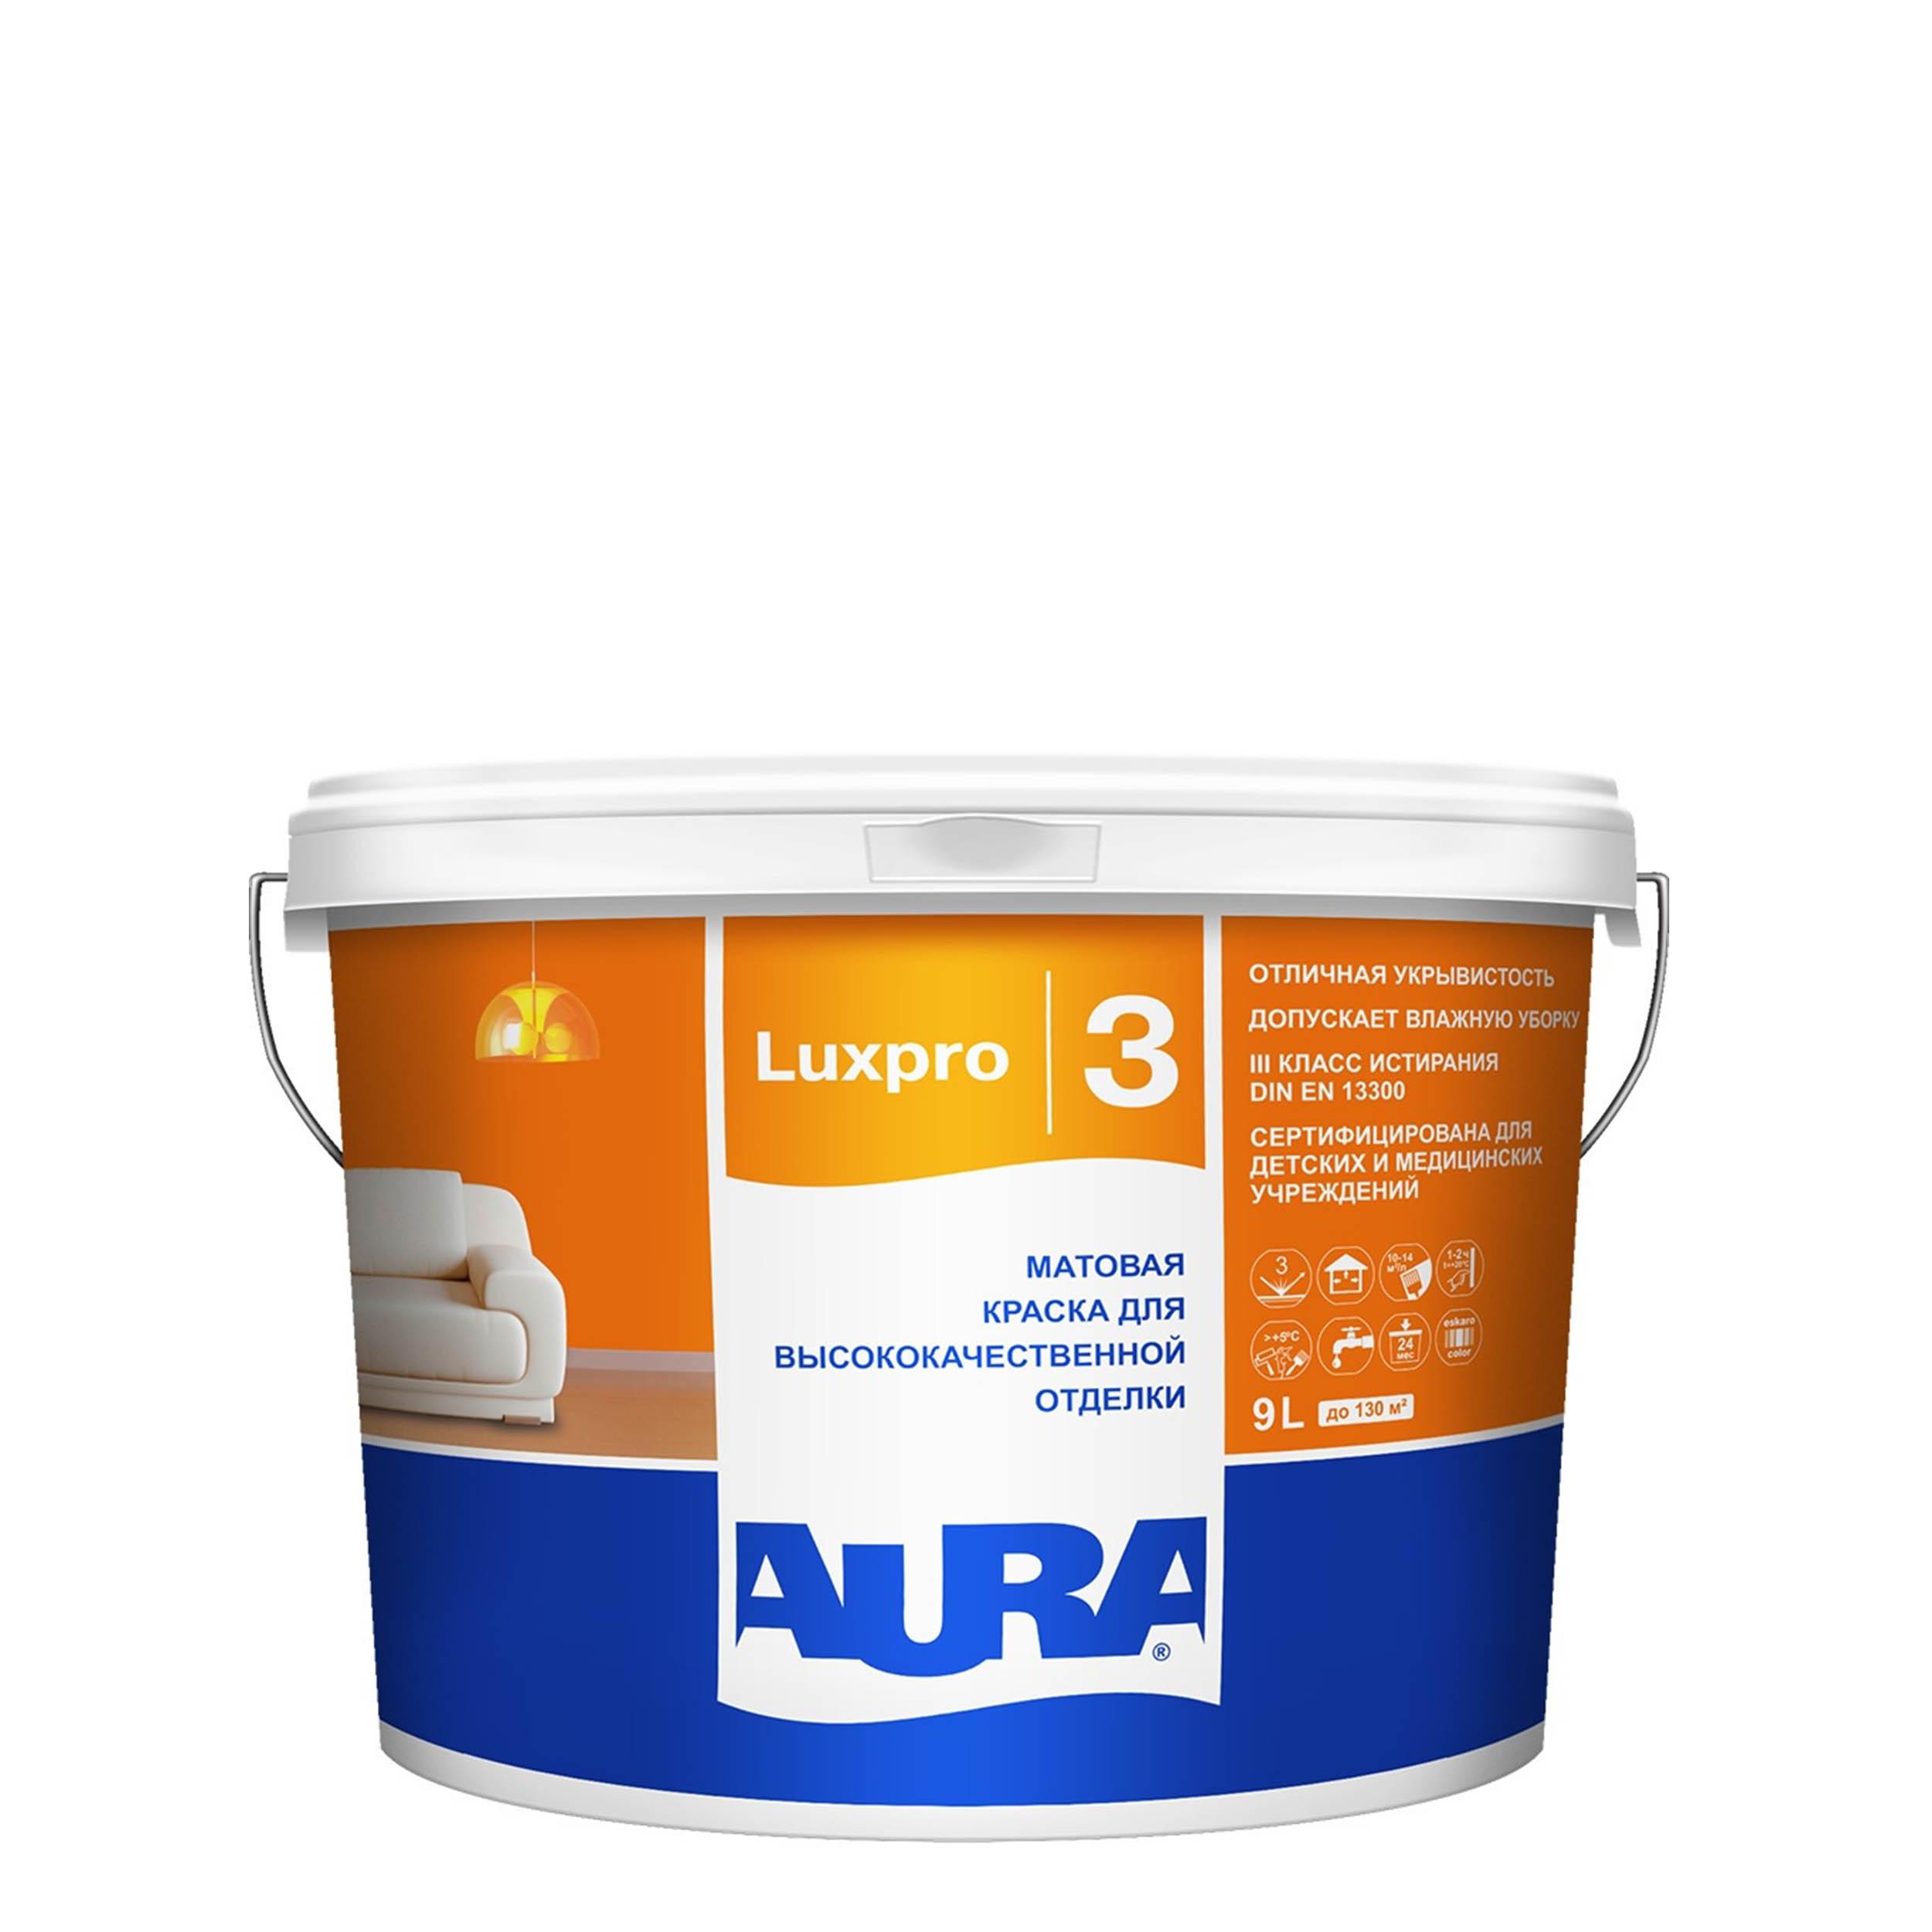 Фото 3 - Краска интерьерная, Aura LuxPRO 3, RAL 7008, 11 кг.